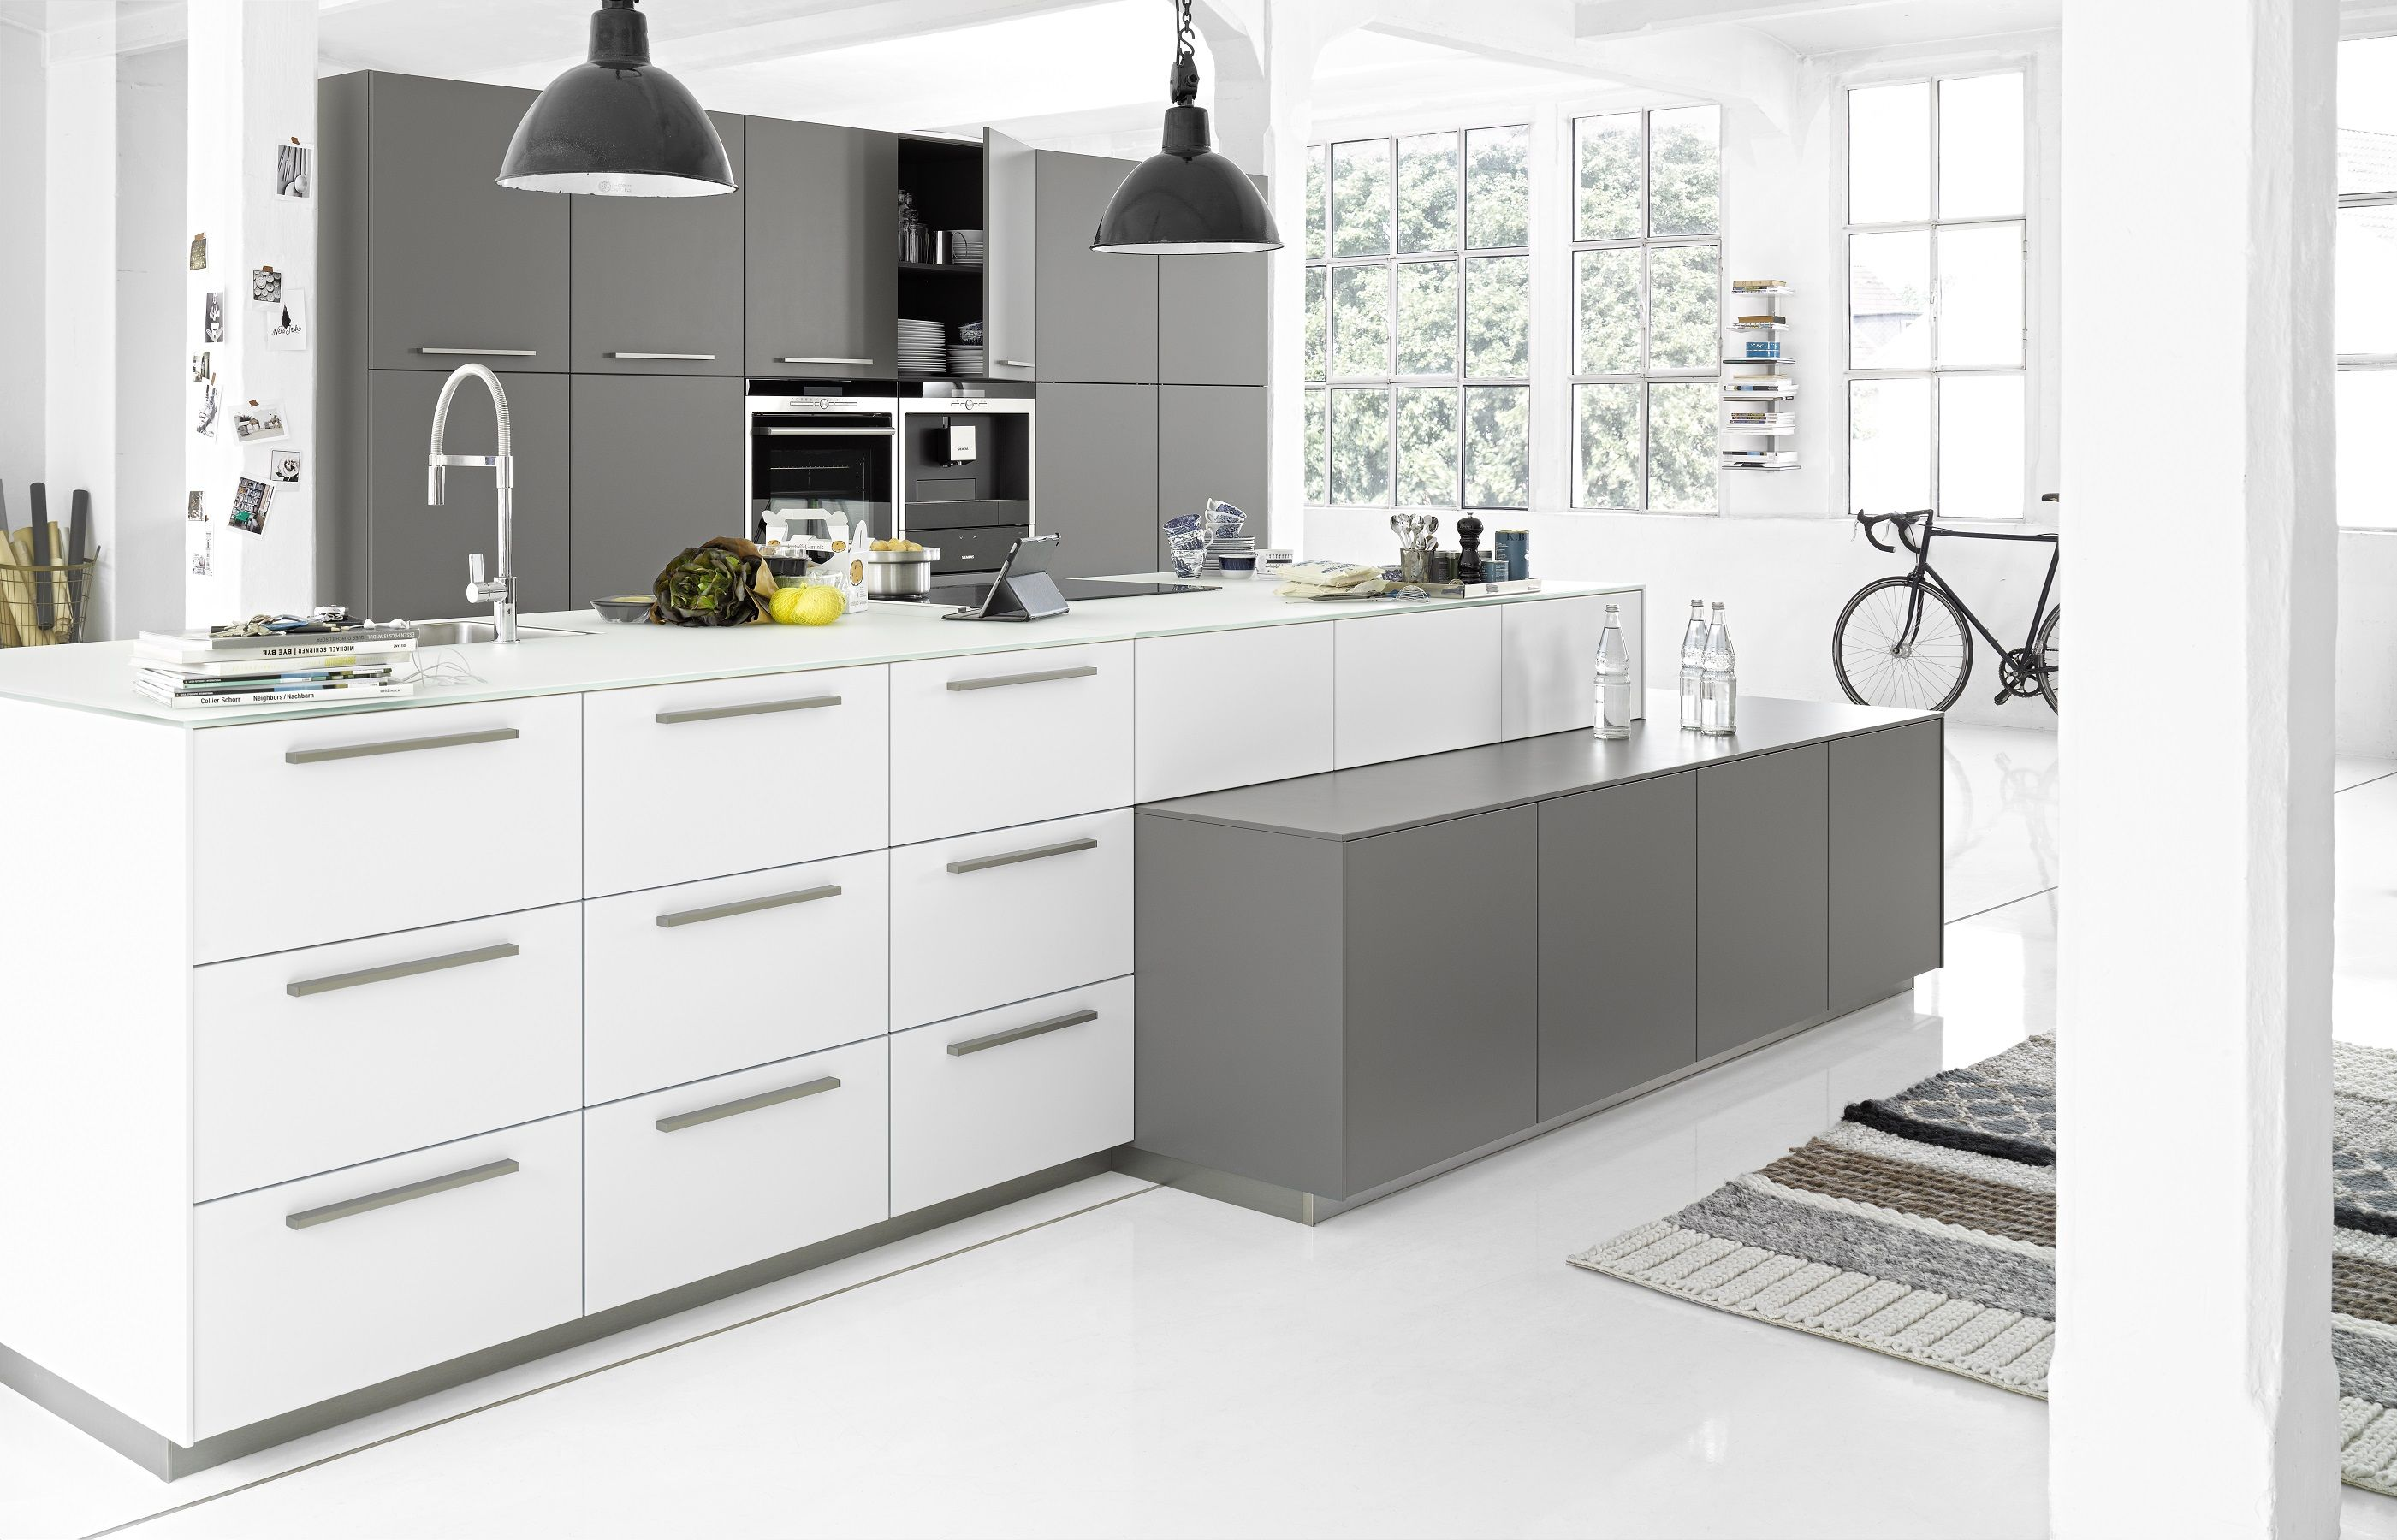 Matrix 900 Moderne küchenideen, Küchen planung, Küchen